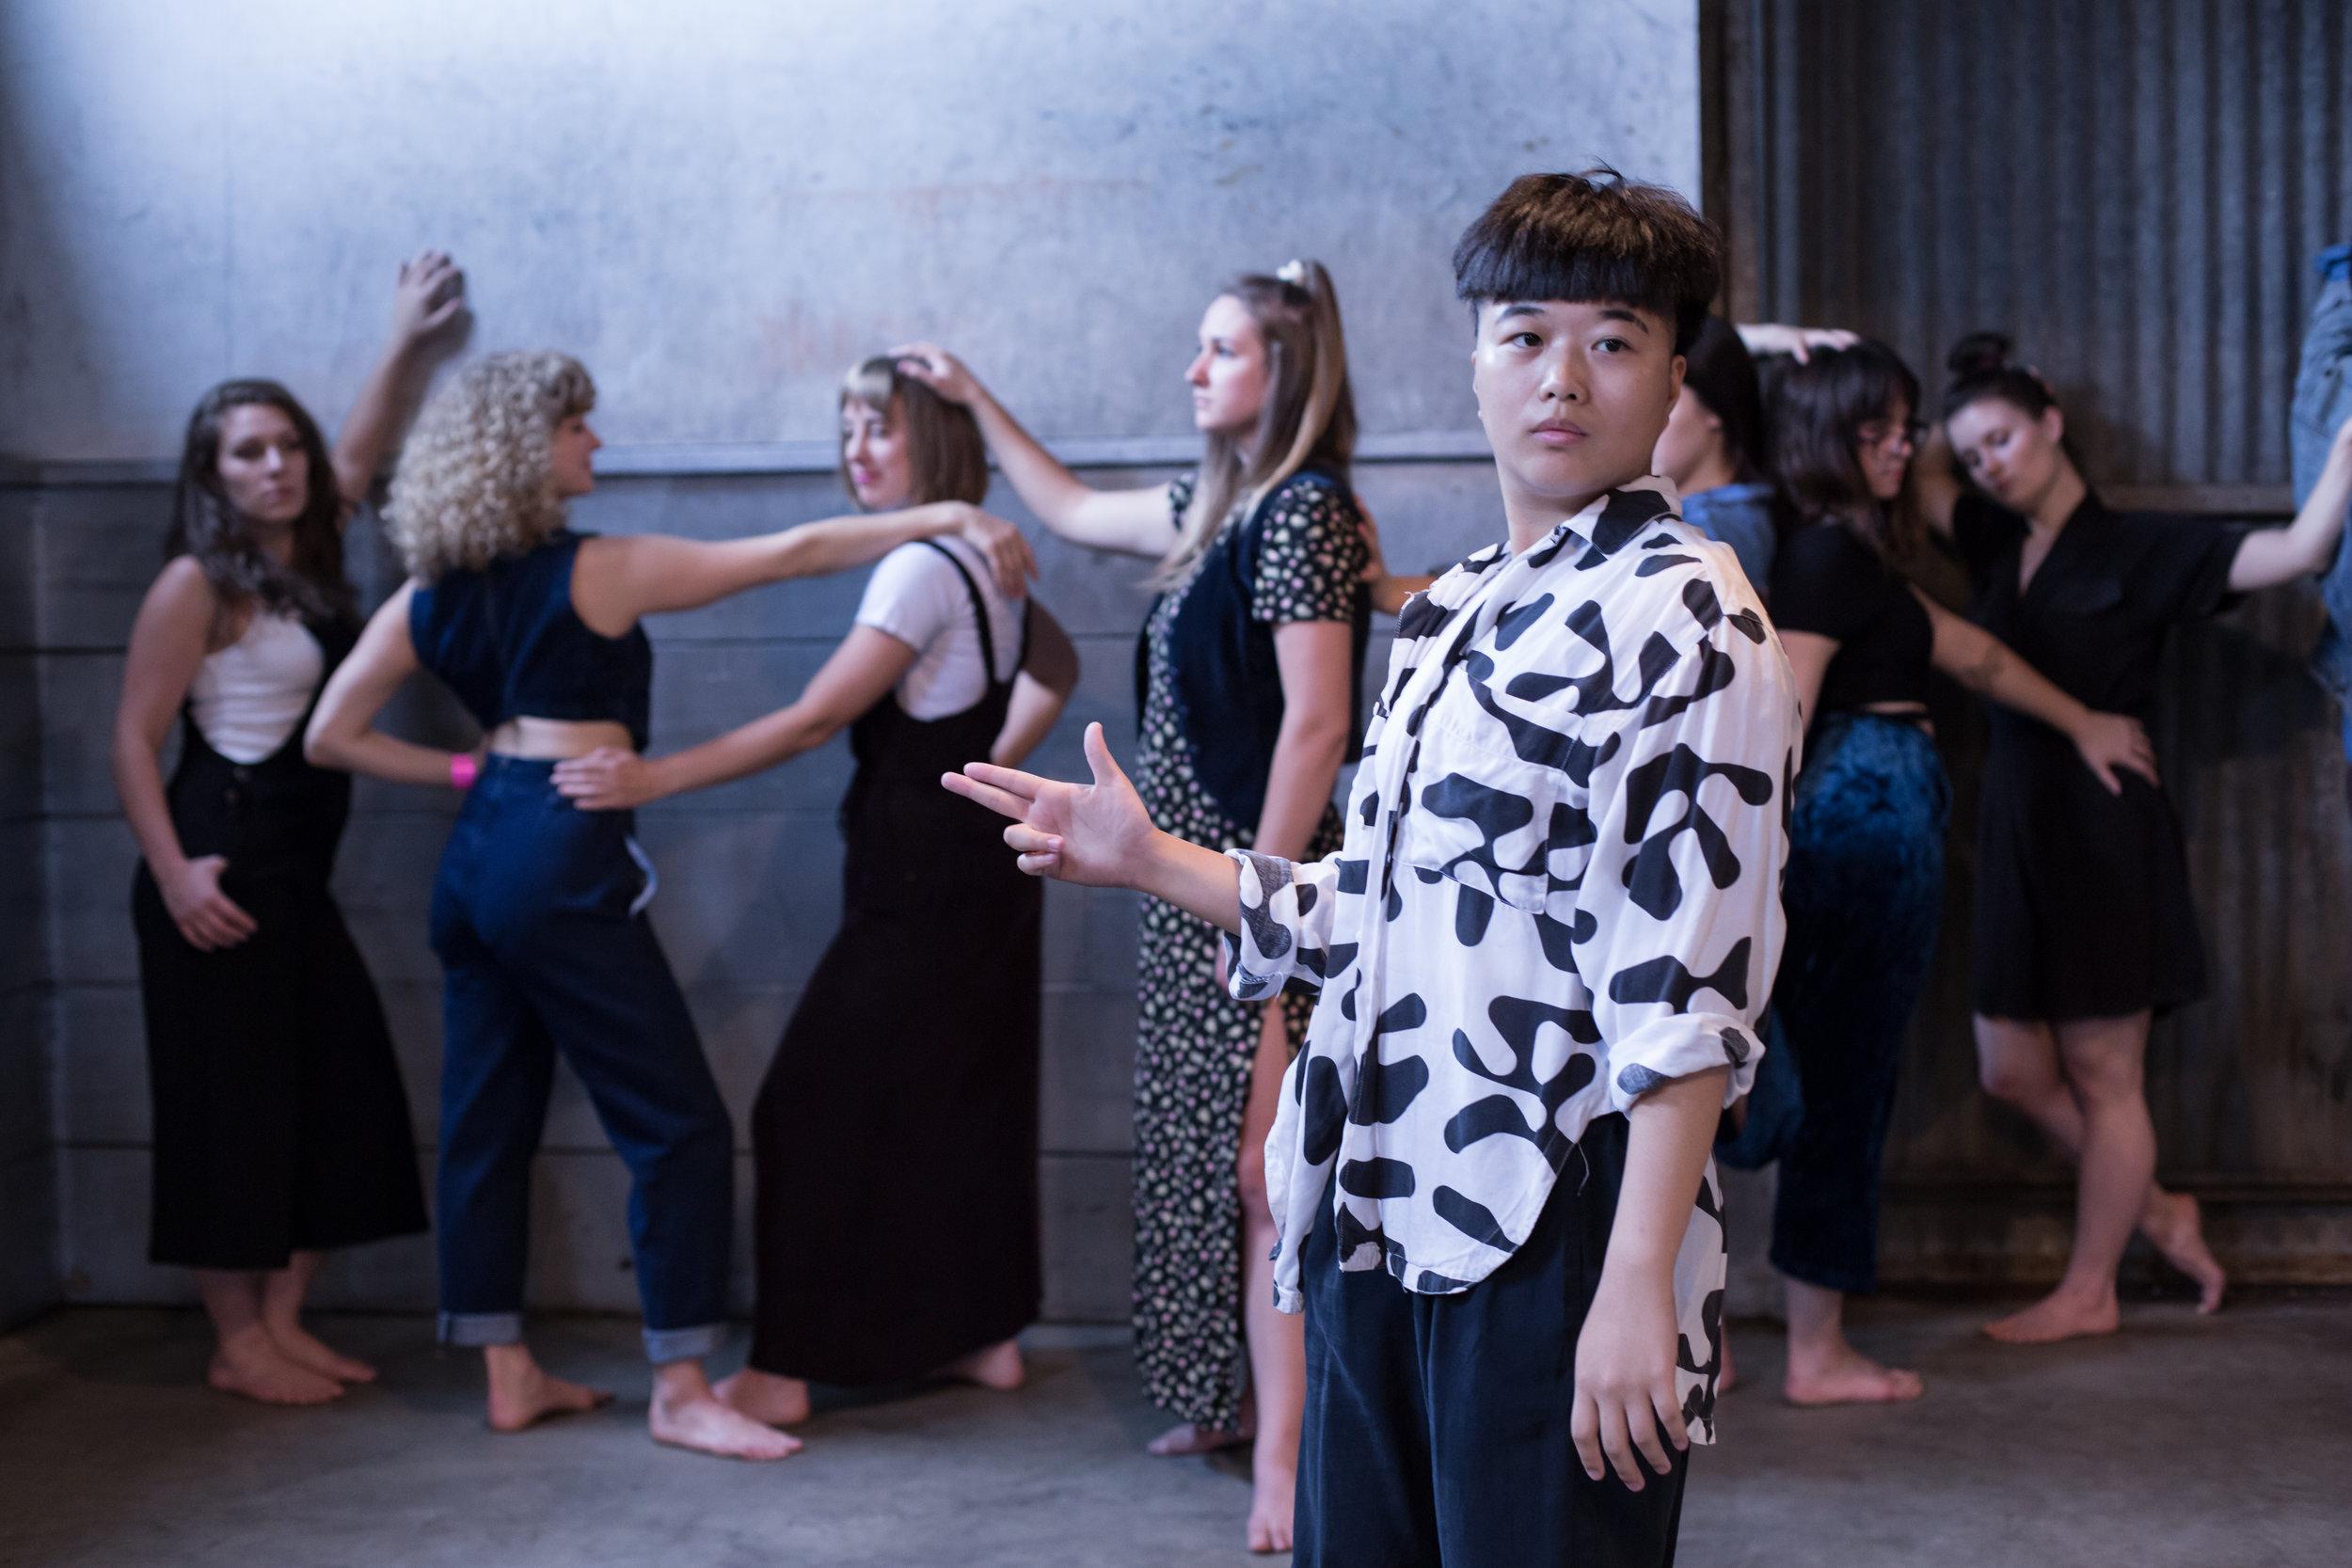 Dancers: Hua-En Hung, Jenny Alperin, Hailley Laurèn, Emily Rushing, Shanna Fragen, Maggie Bailey, Laura Mobley